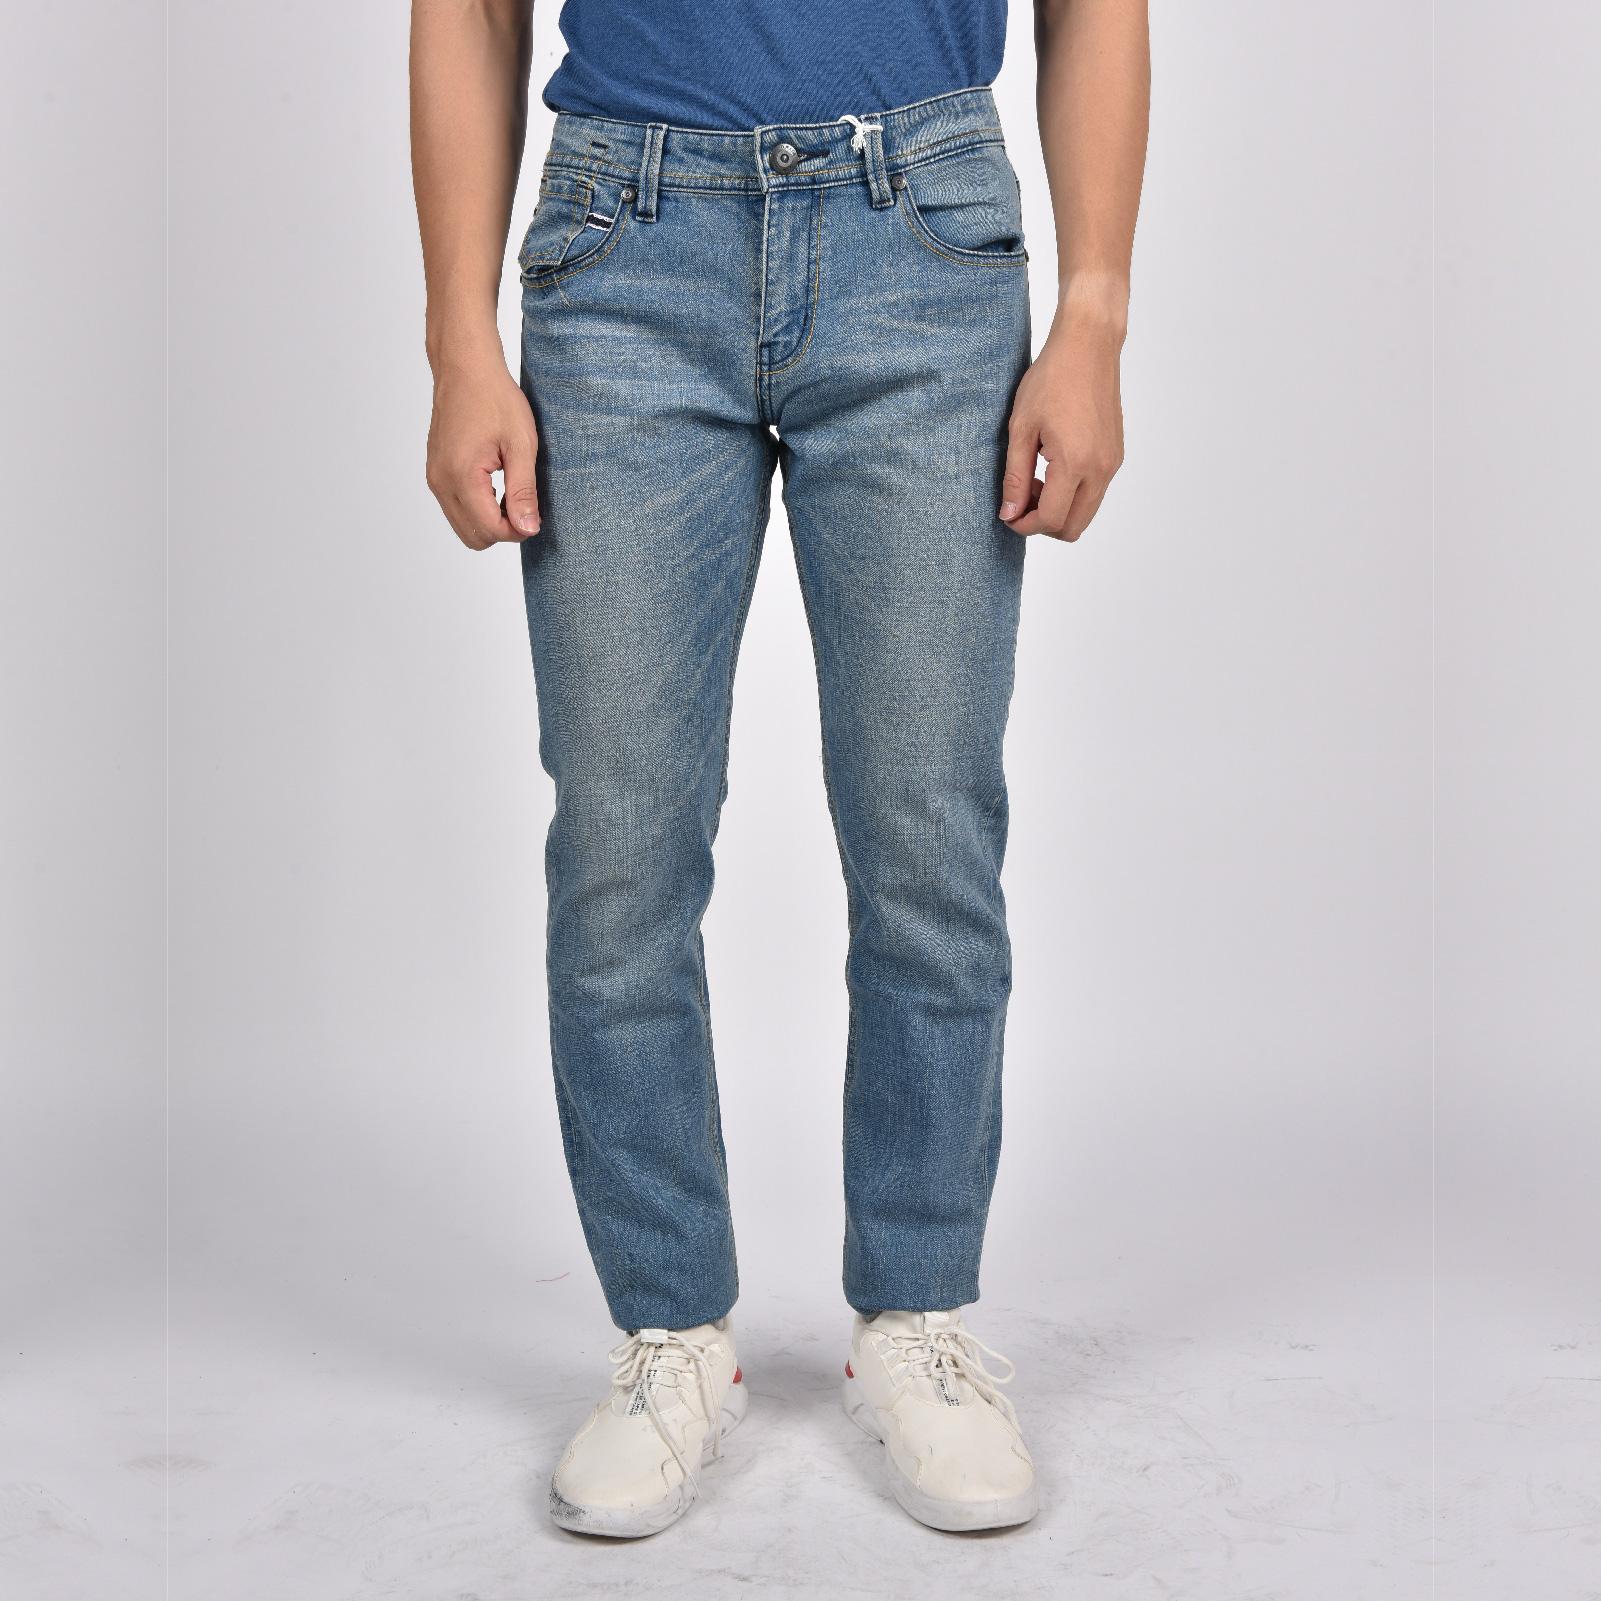 Quần Jeans Dài Nam O.Jeans -5QDJ830487BM